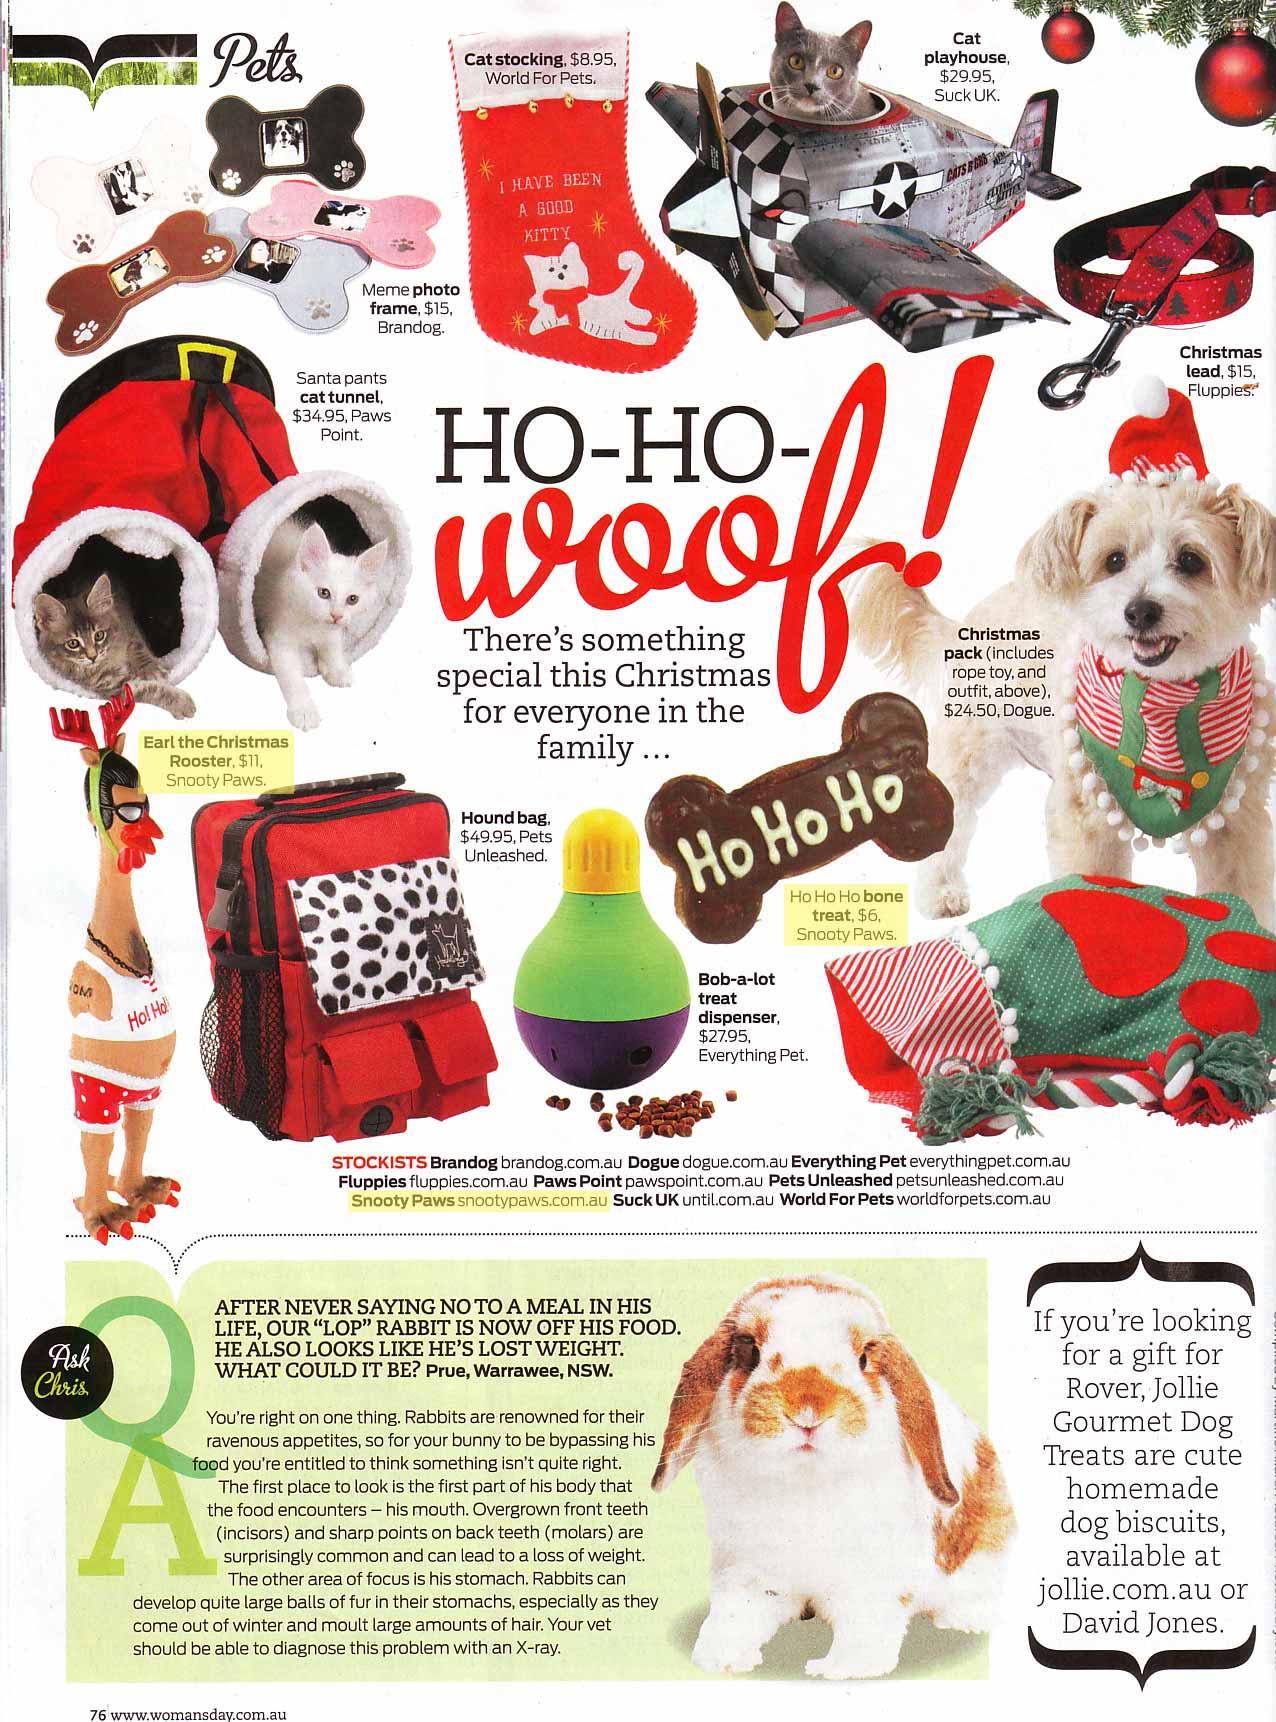 Woman's Day Magazine - December 2010